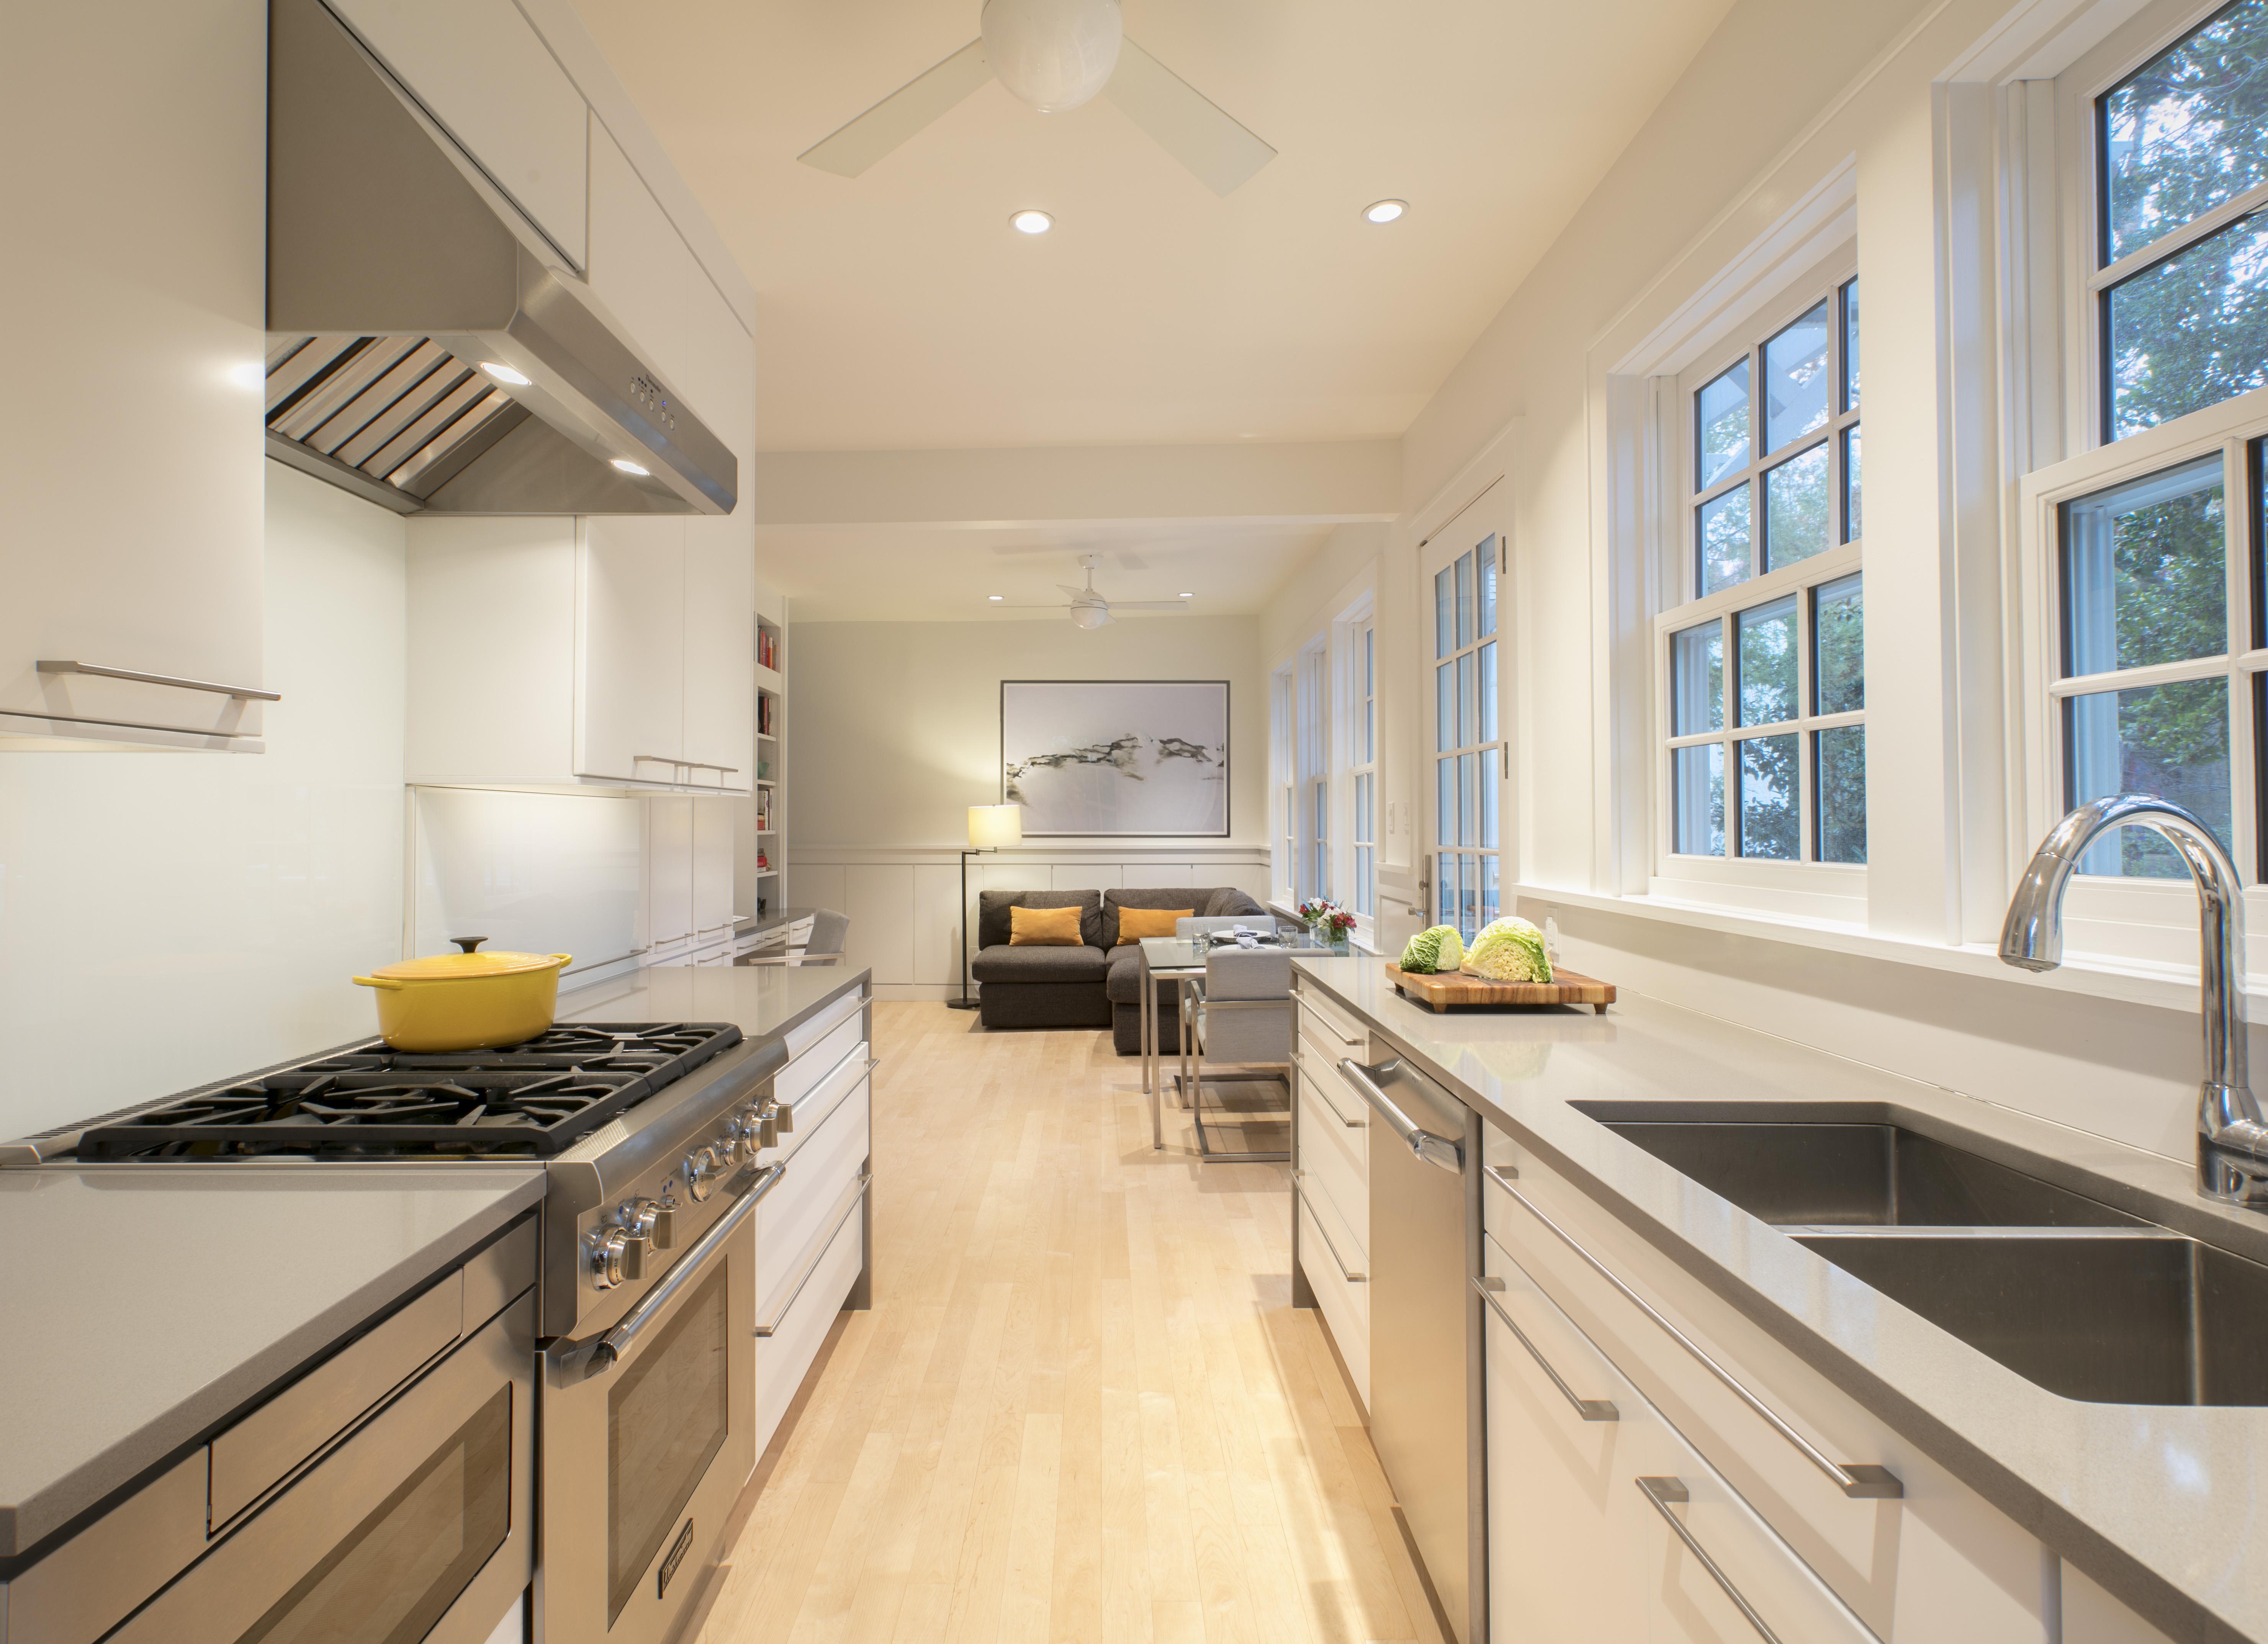 Galley Kitchen Gets An Update Hillrag